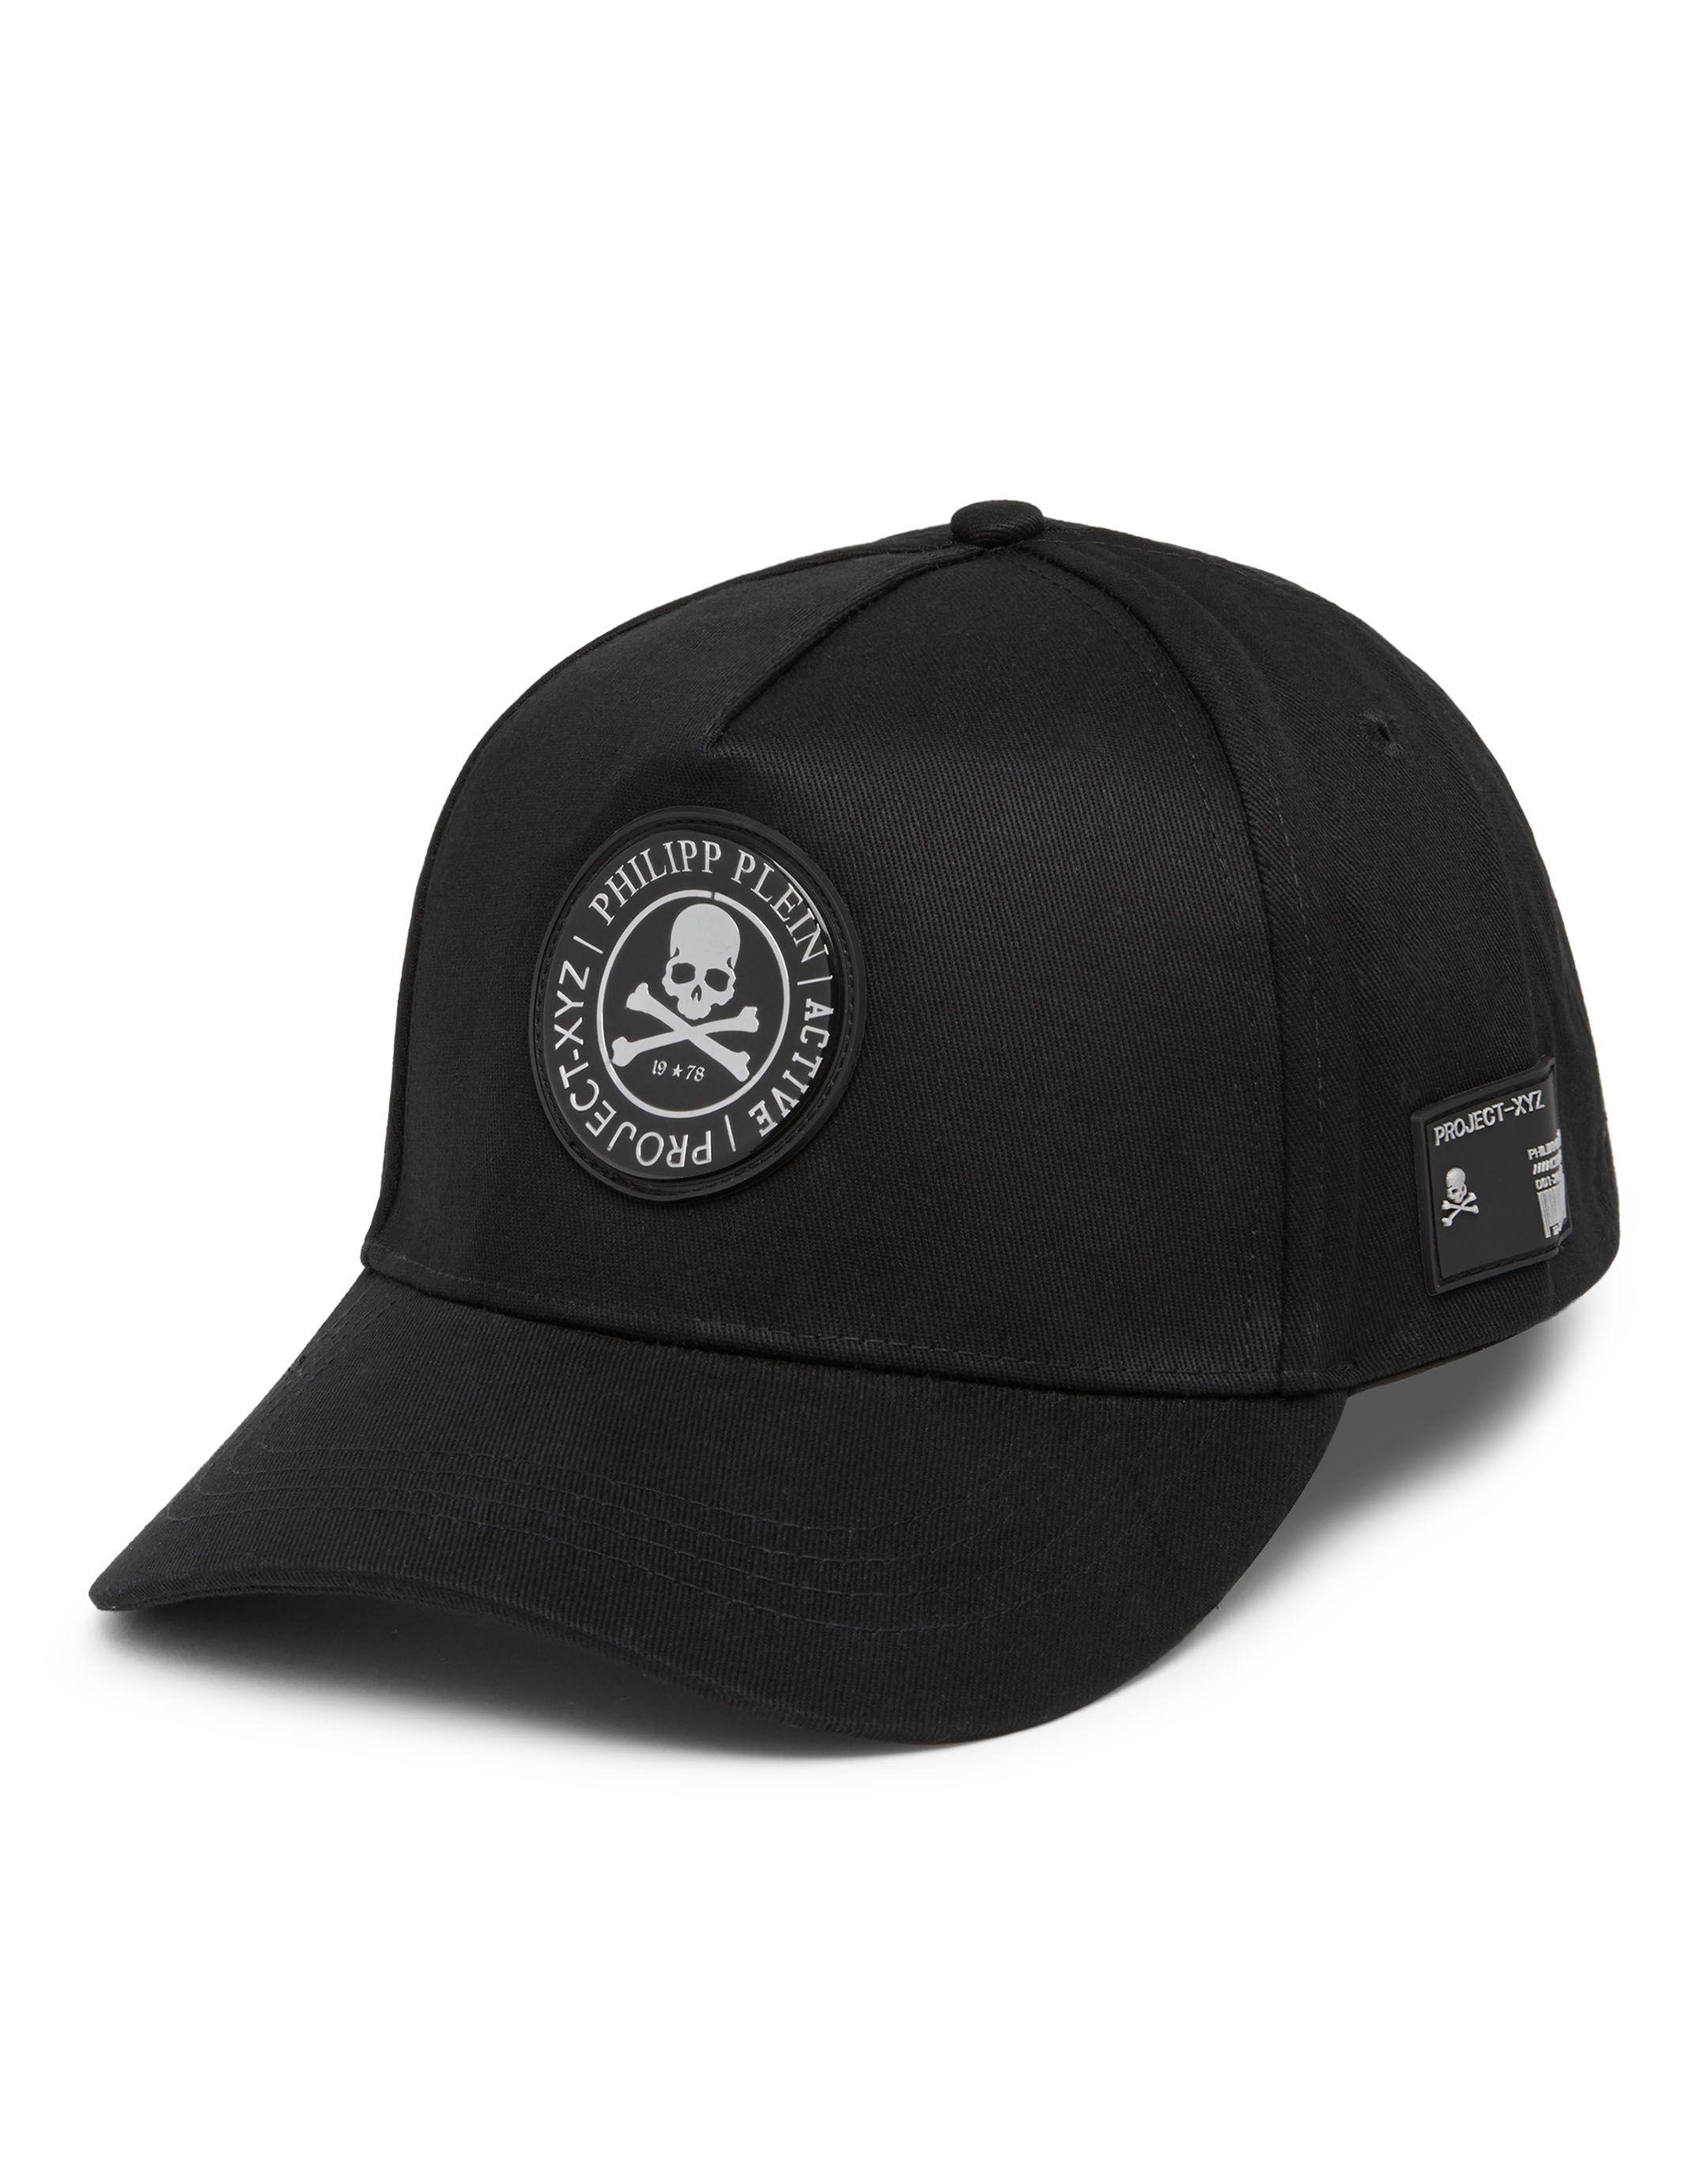 67daa6e3d20 PHILIPP PLEIN VISOR HAT.  philippplein